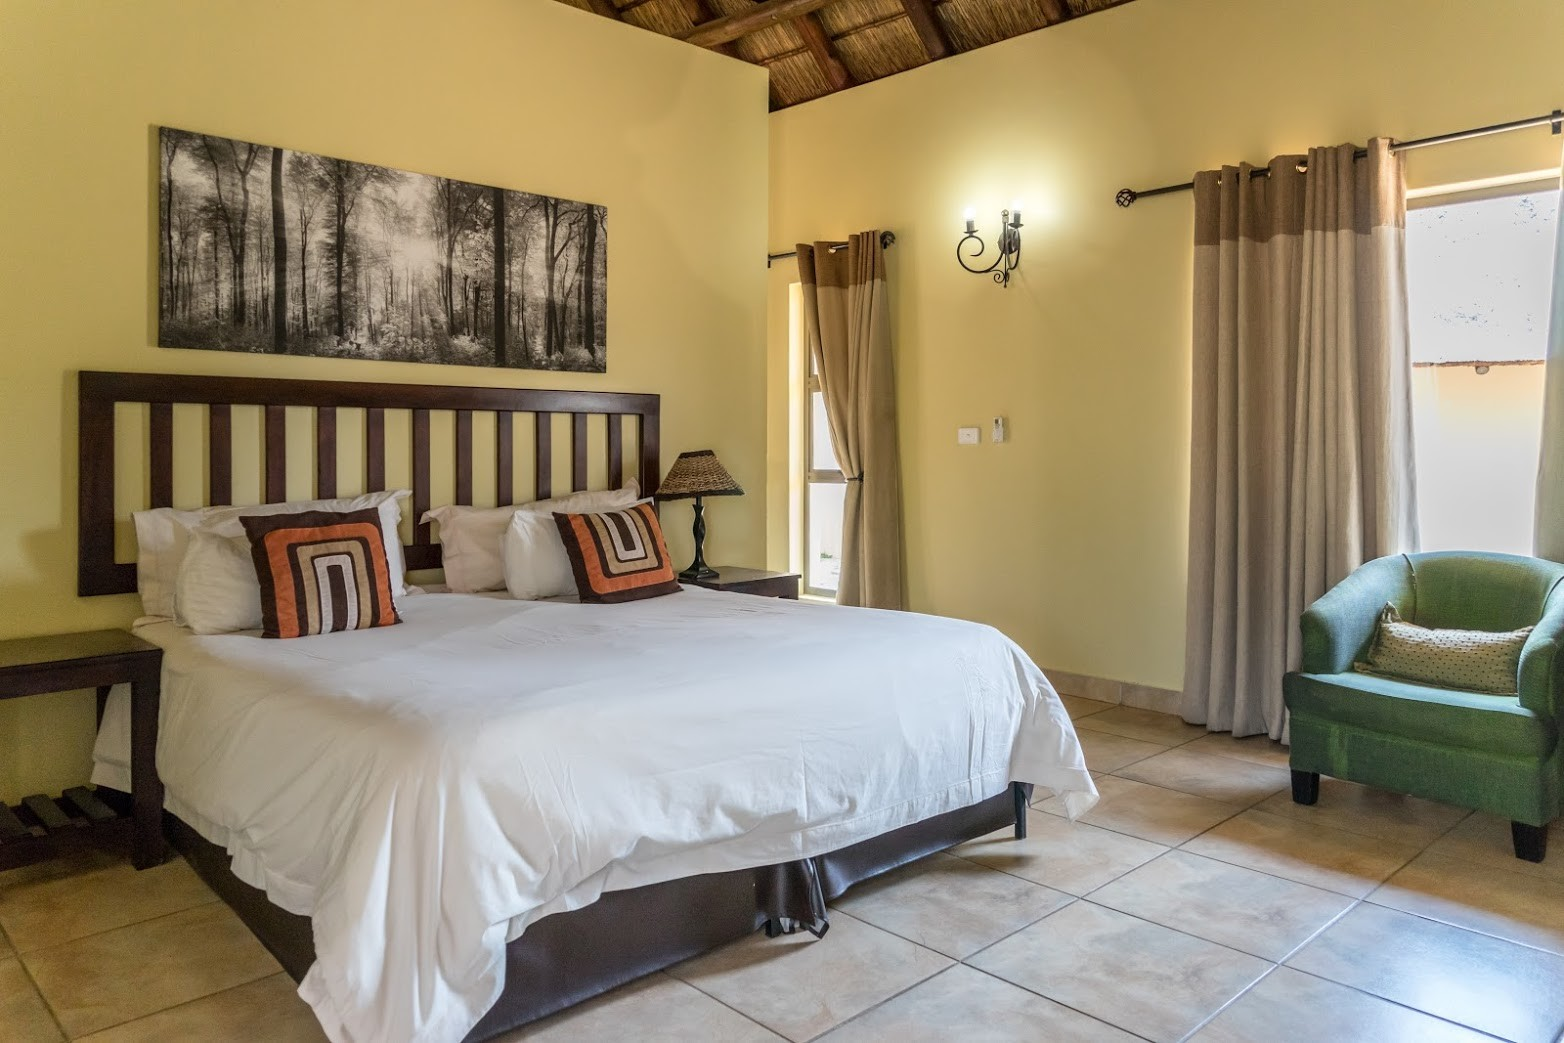 zebula,self-catering,breakaway,golf,bushveld,Bela Bela,Limpopo